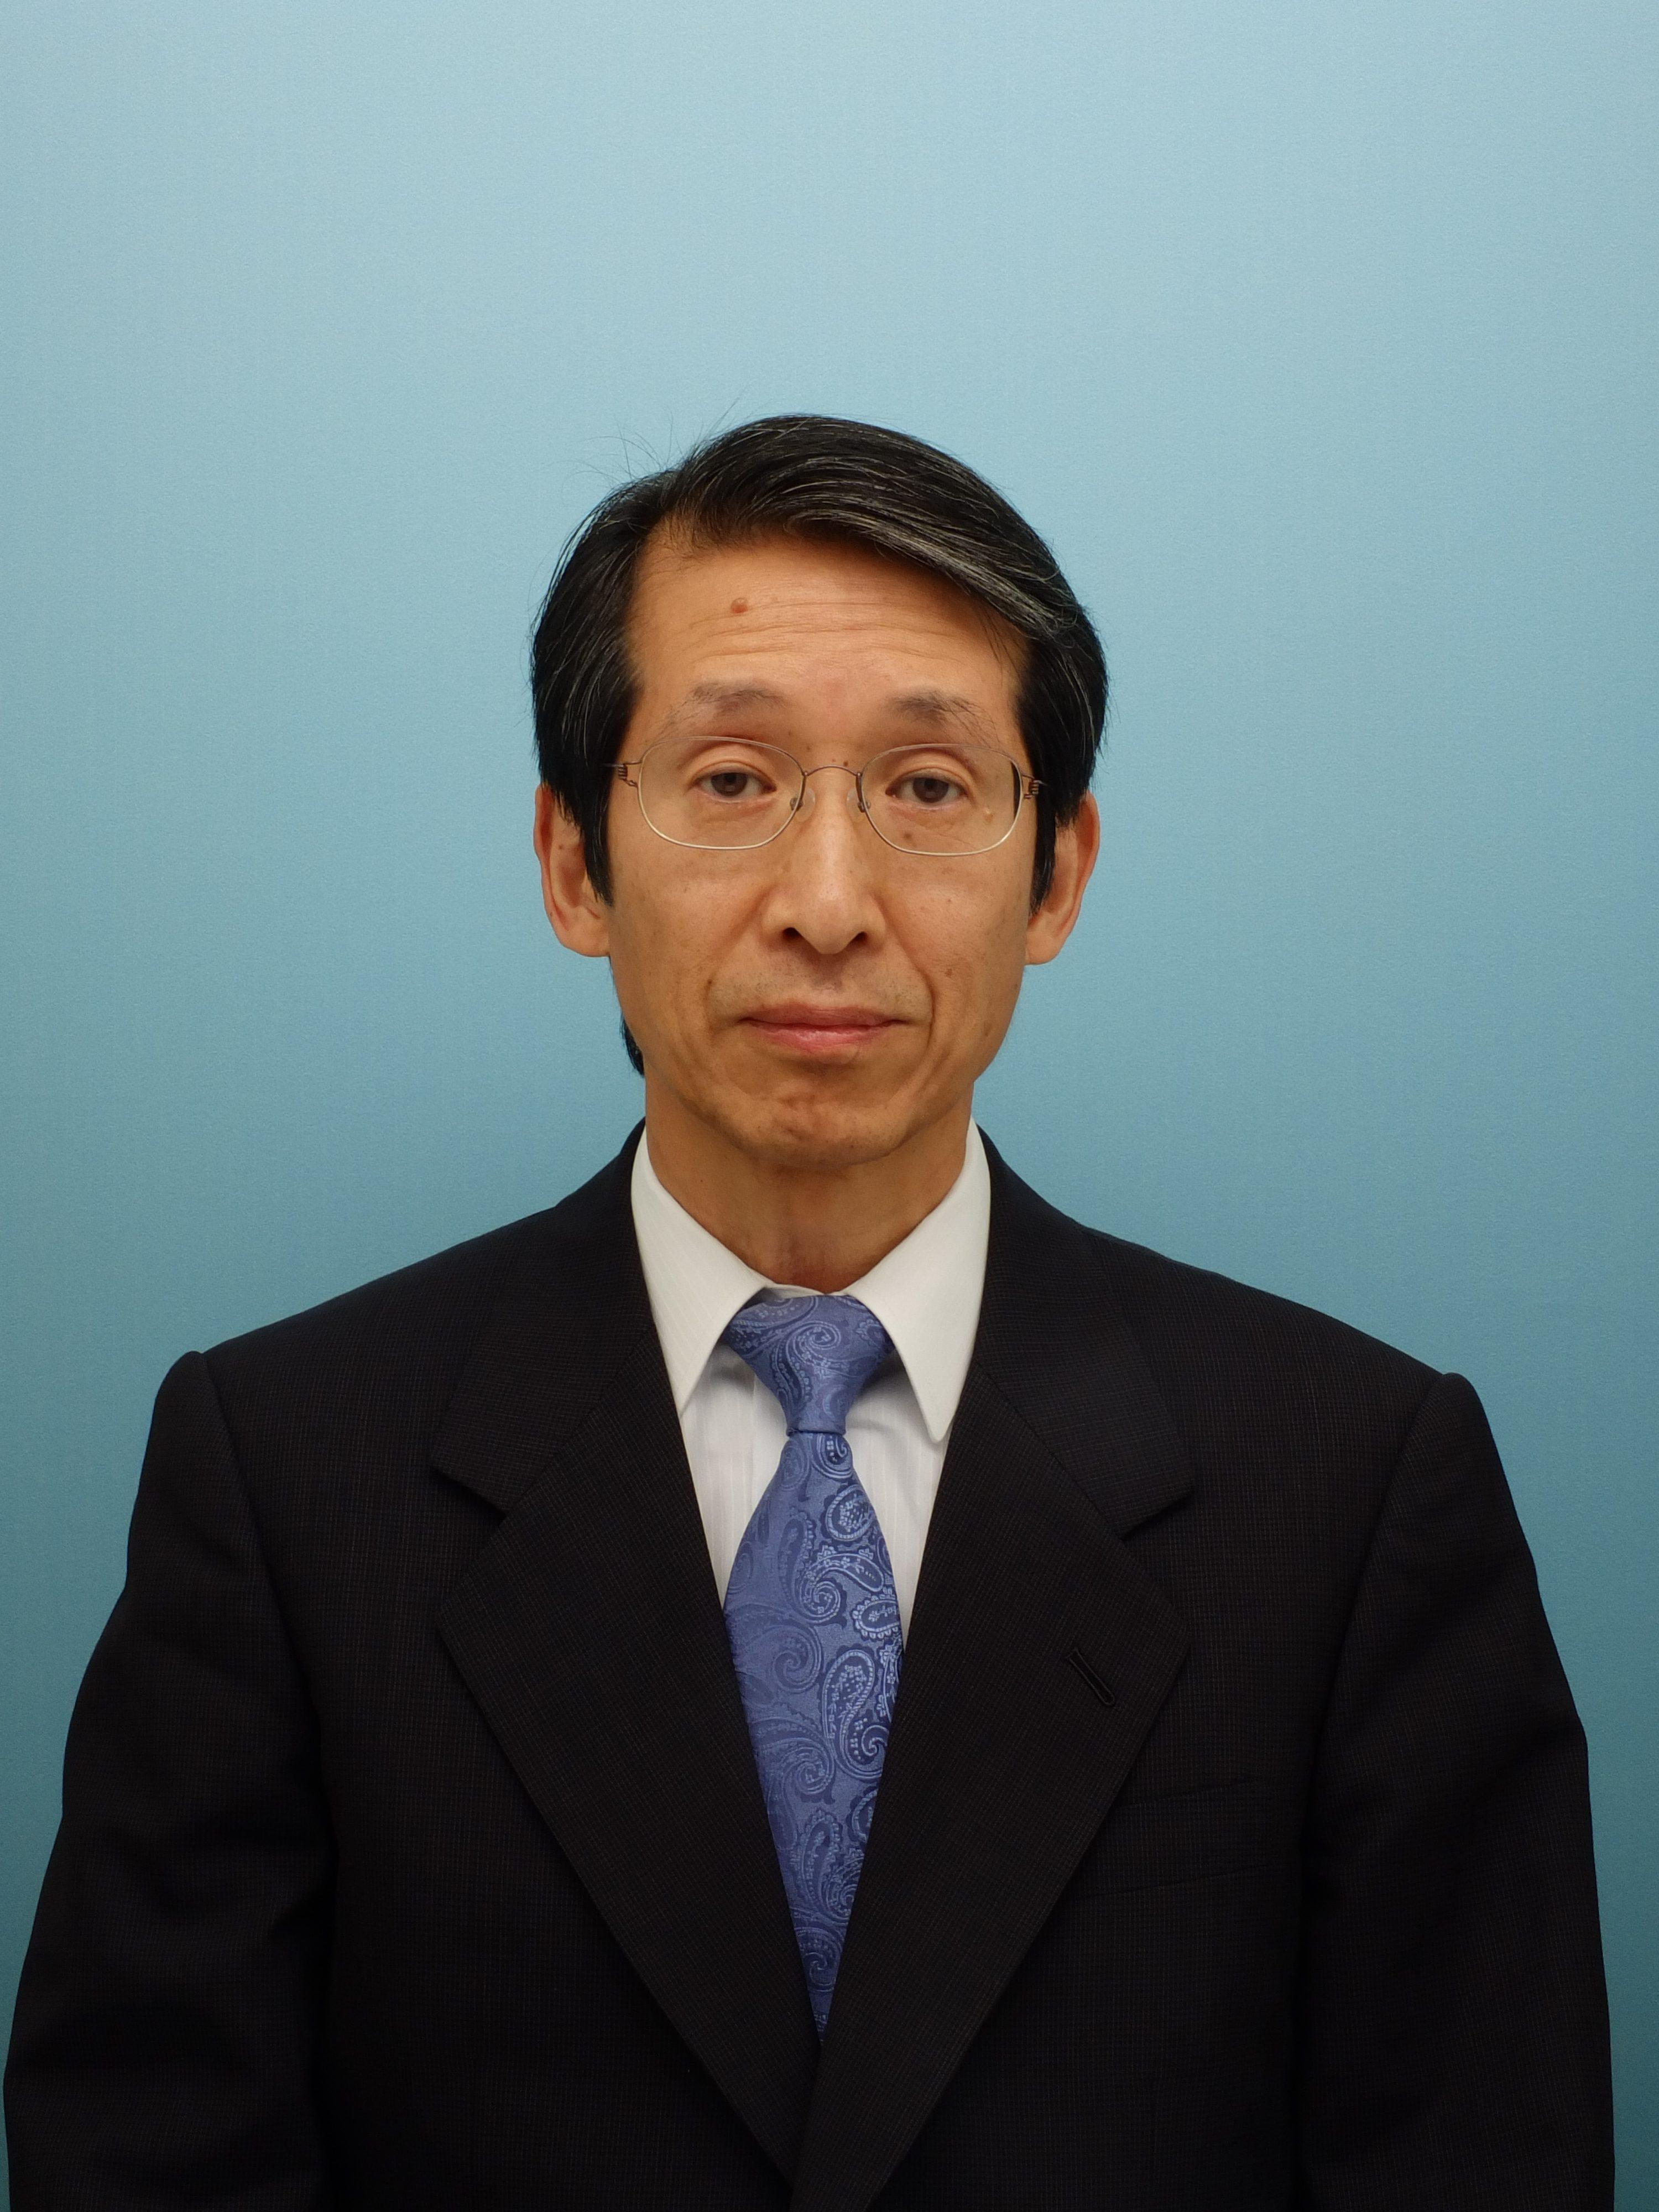 Kozo Yamaguchi